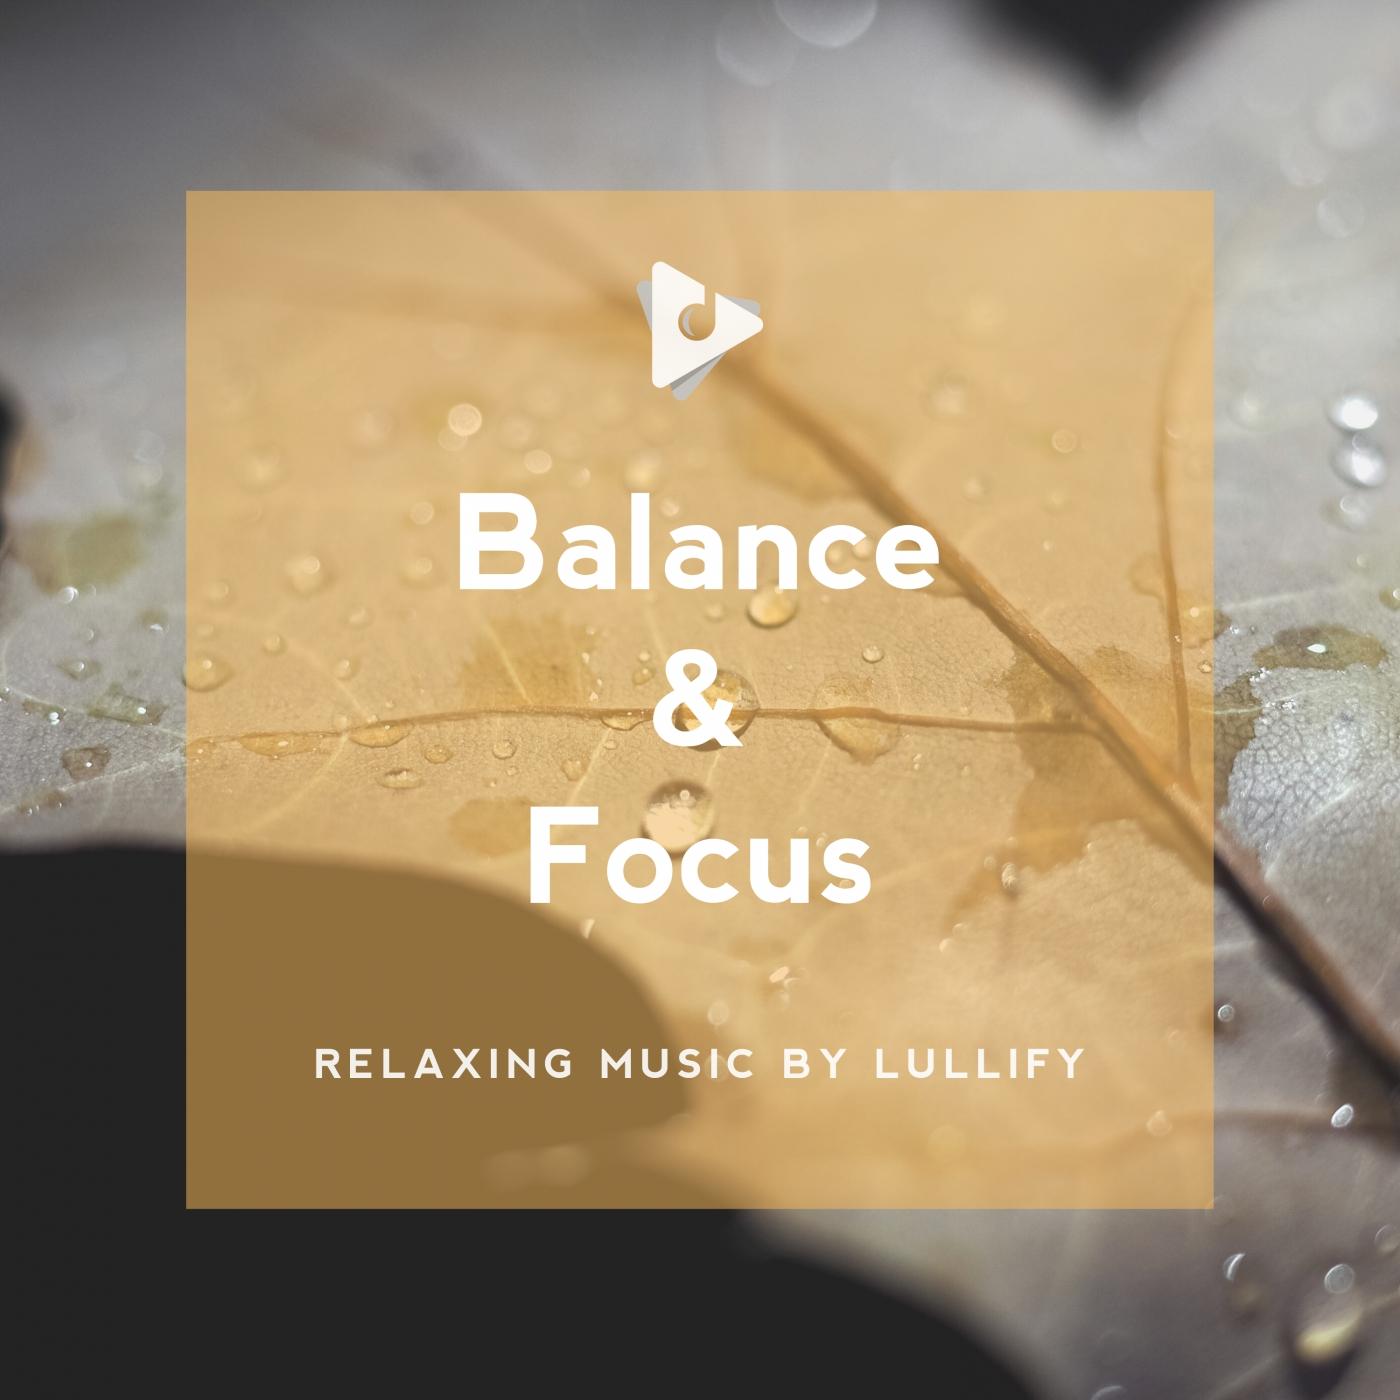 Balance & Focus